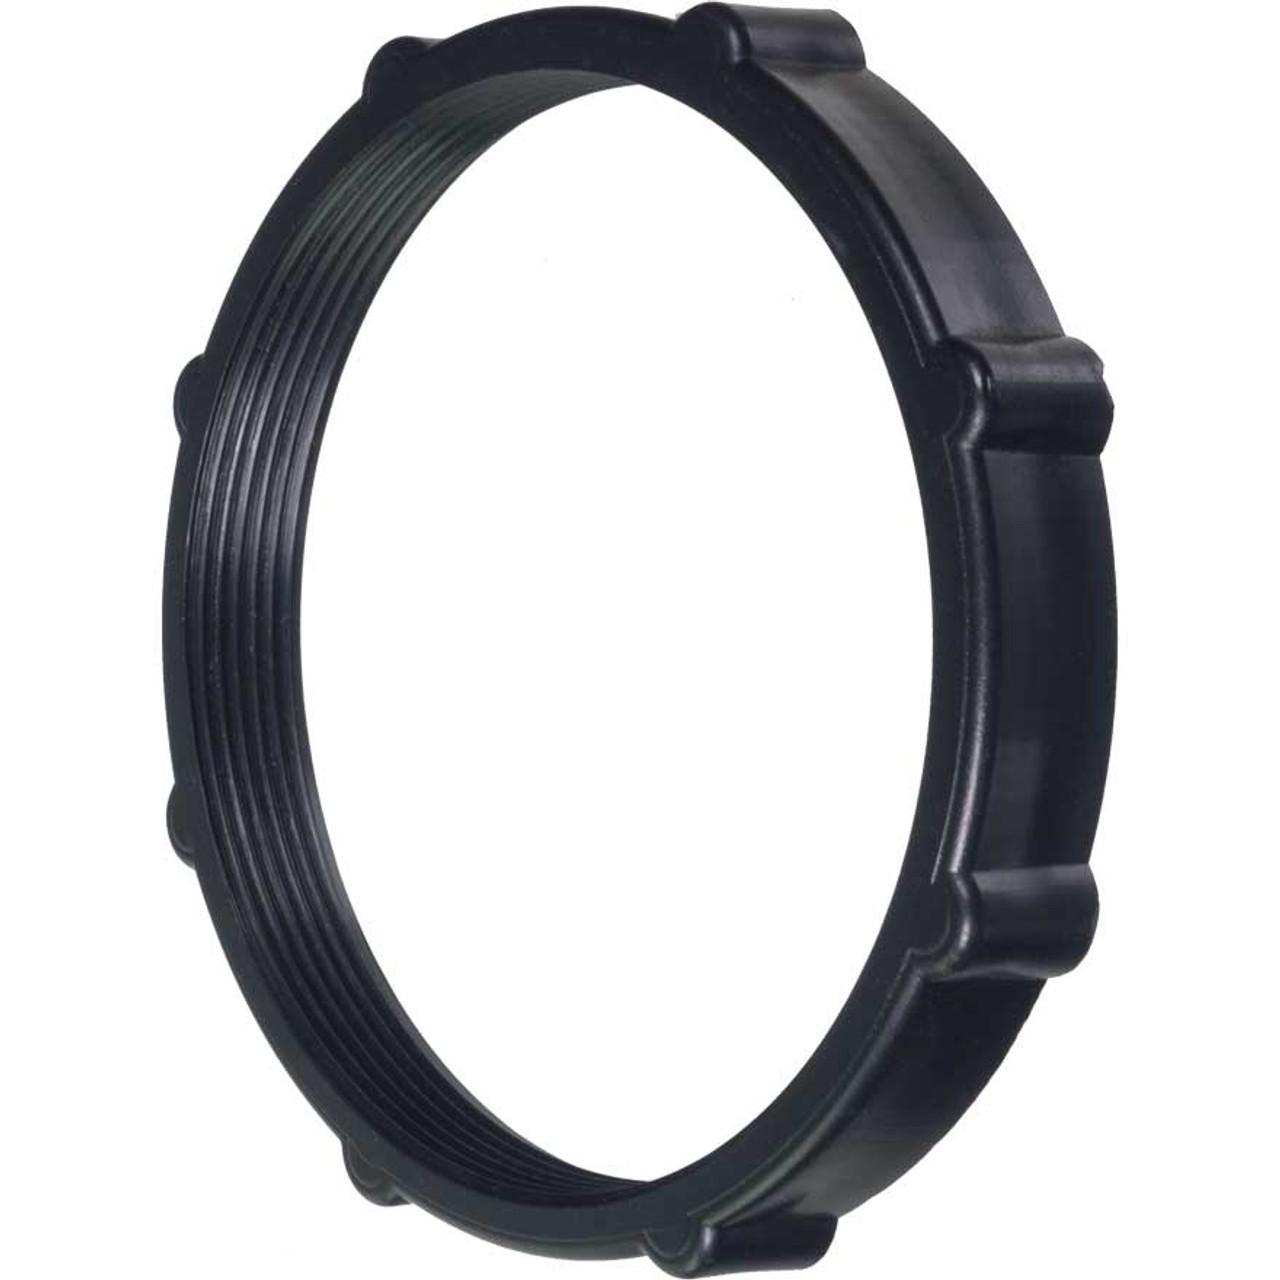 "Spin Lock Ring for 3 3/8"" Gauges"